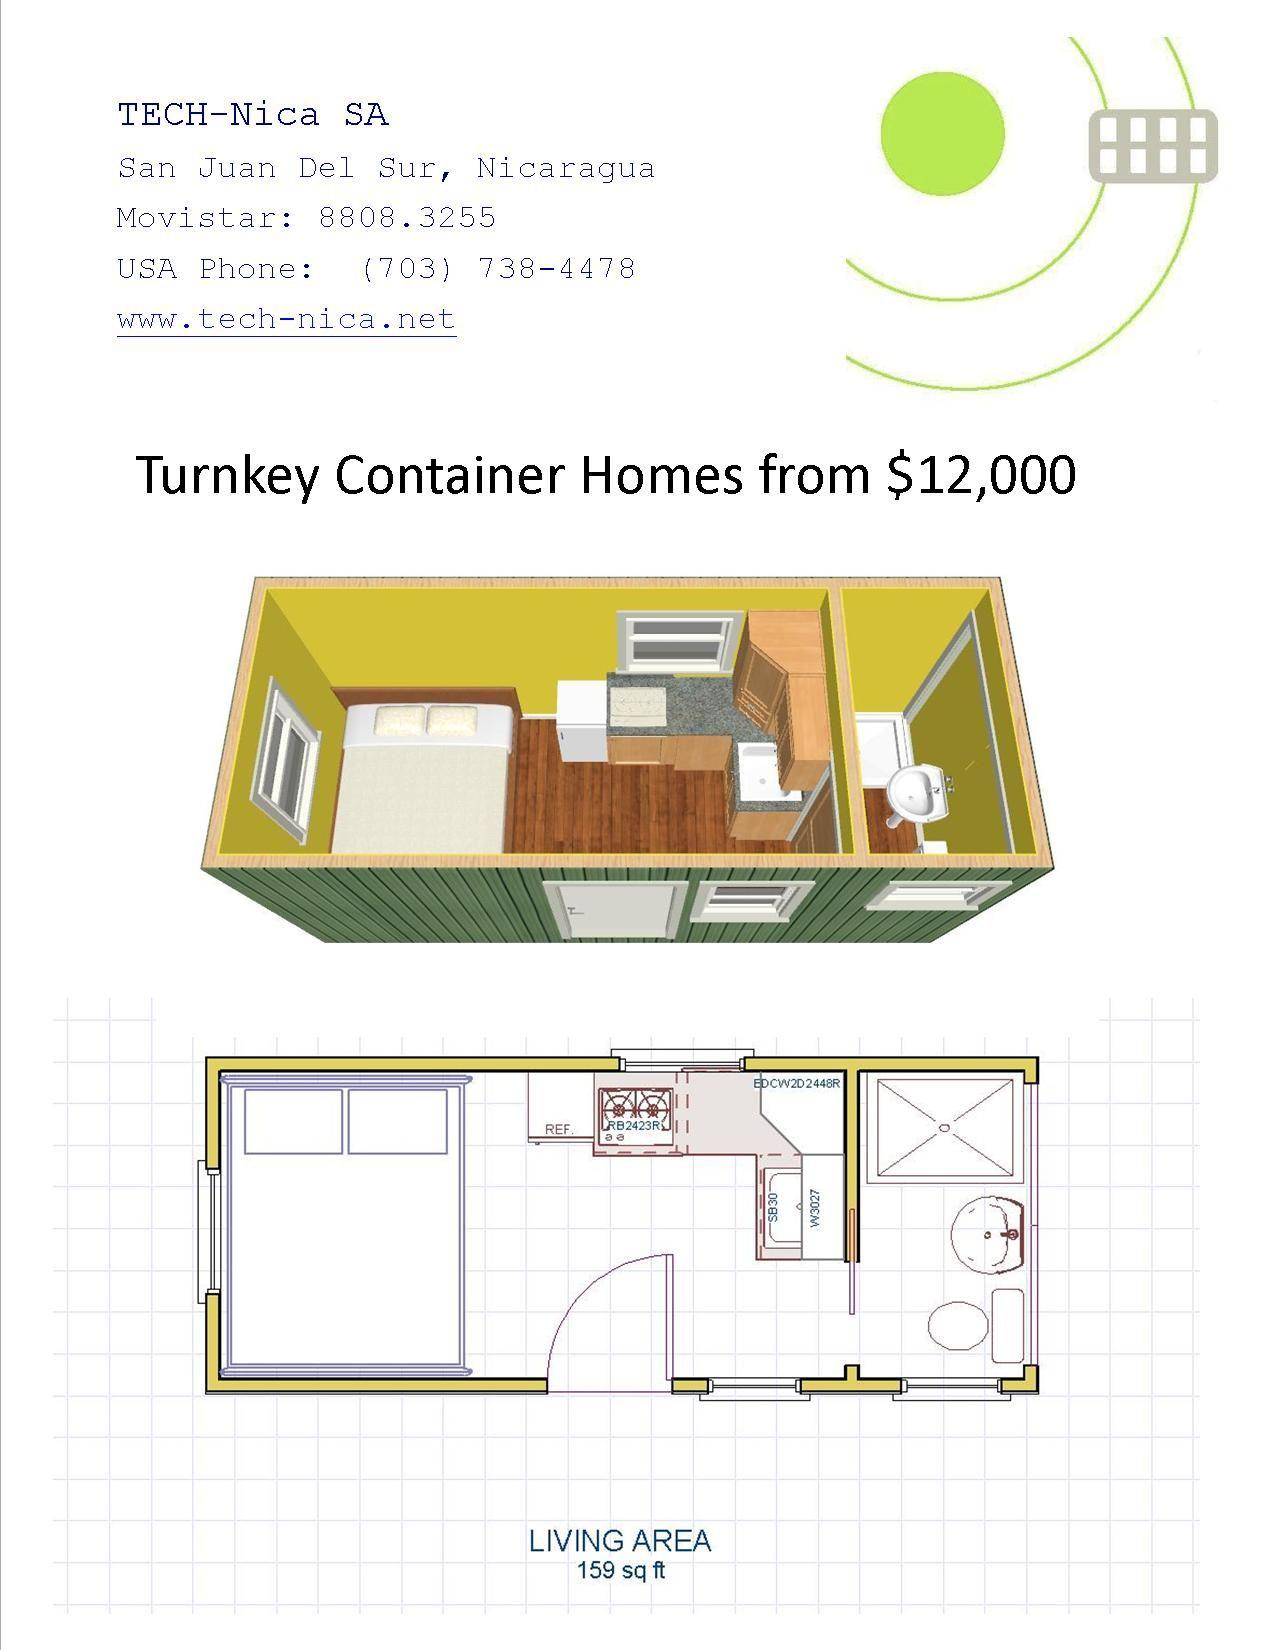 Best Kitchen Gallery: 20ft Container House Buscar Con Google Planos Casas Contenedores of Storage Container Shotgun Home Plans on rachelxblog.com